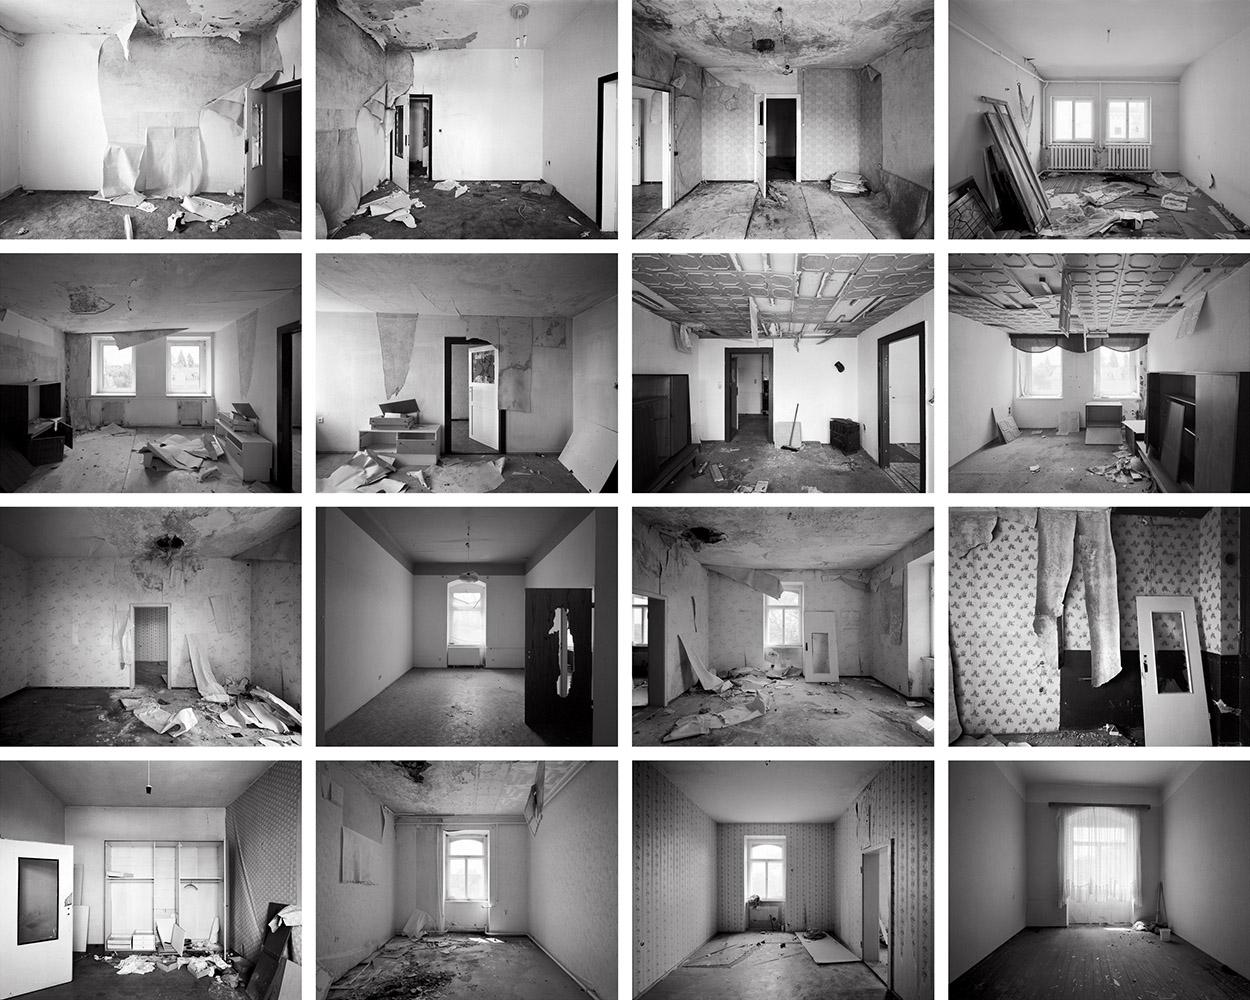 Fredrik Marsh, Abandoned Apartment Complex, Cotta District